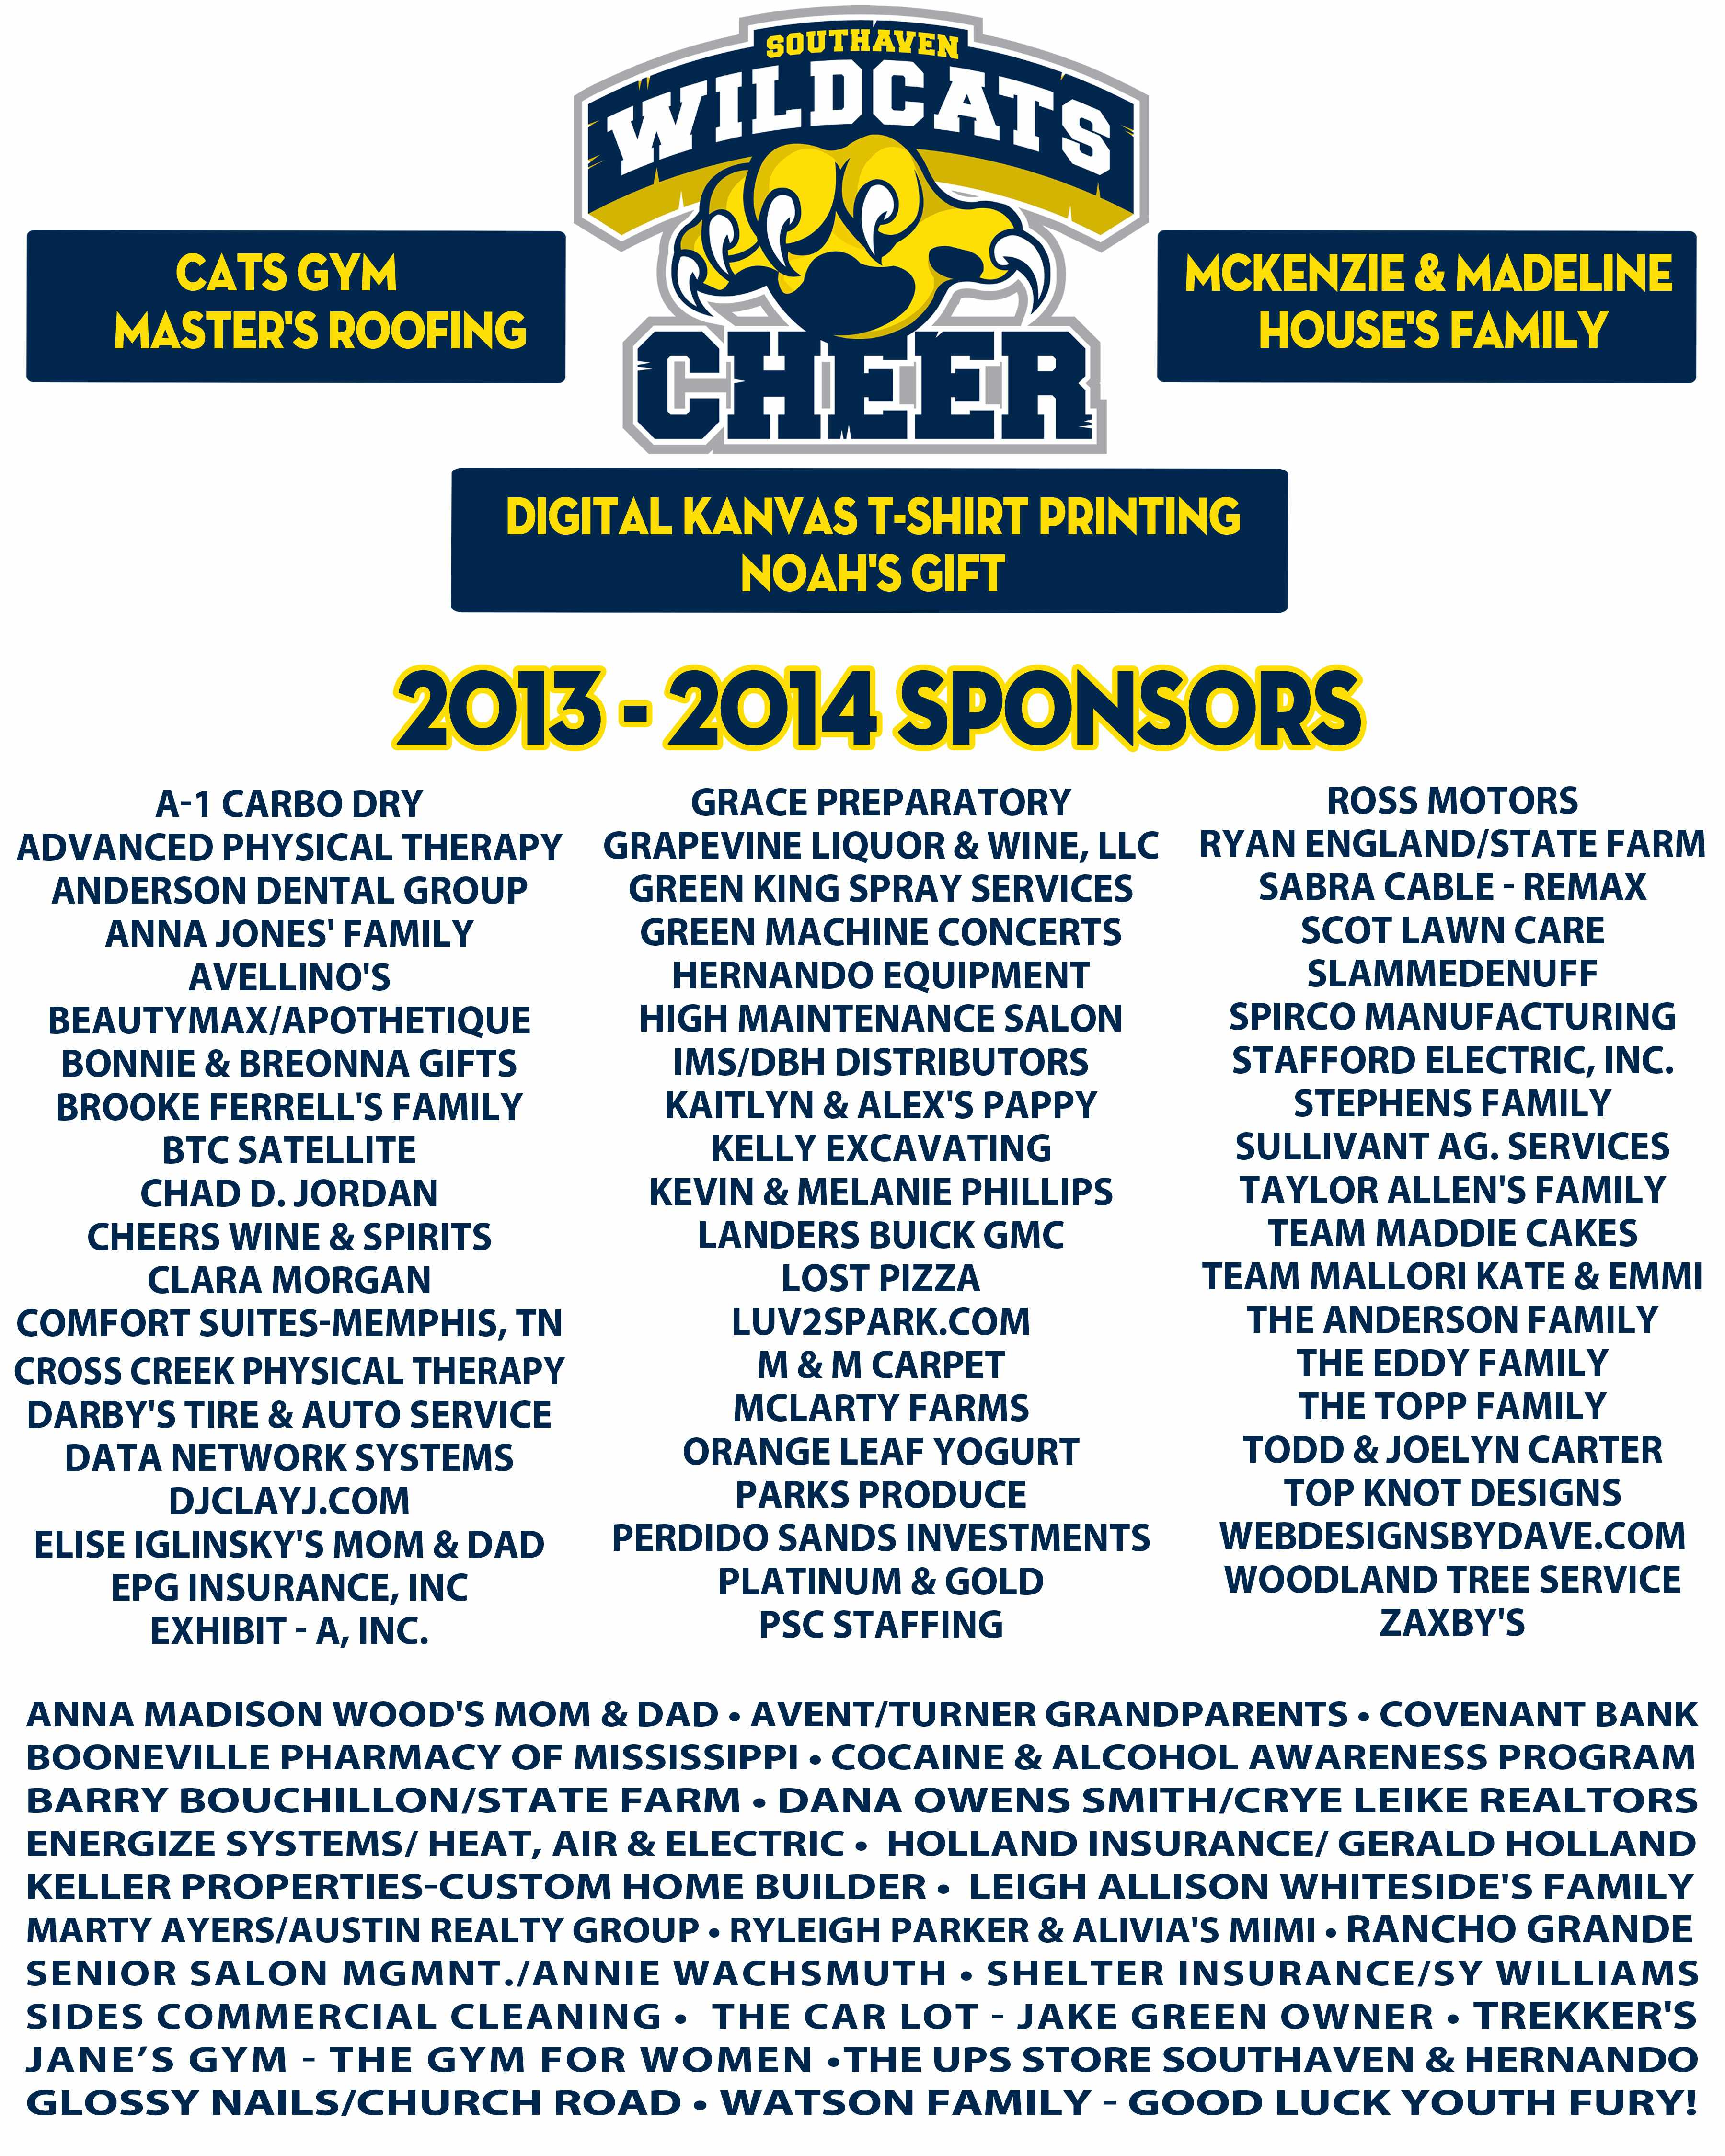 2013-2014 Sponsors